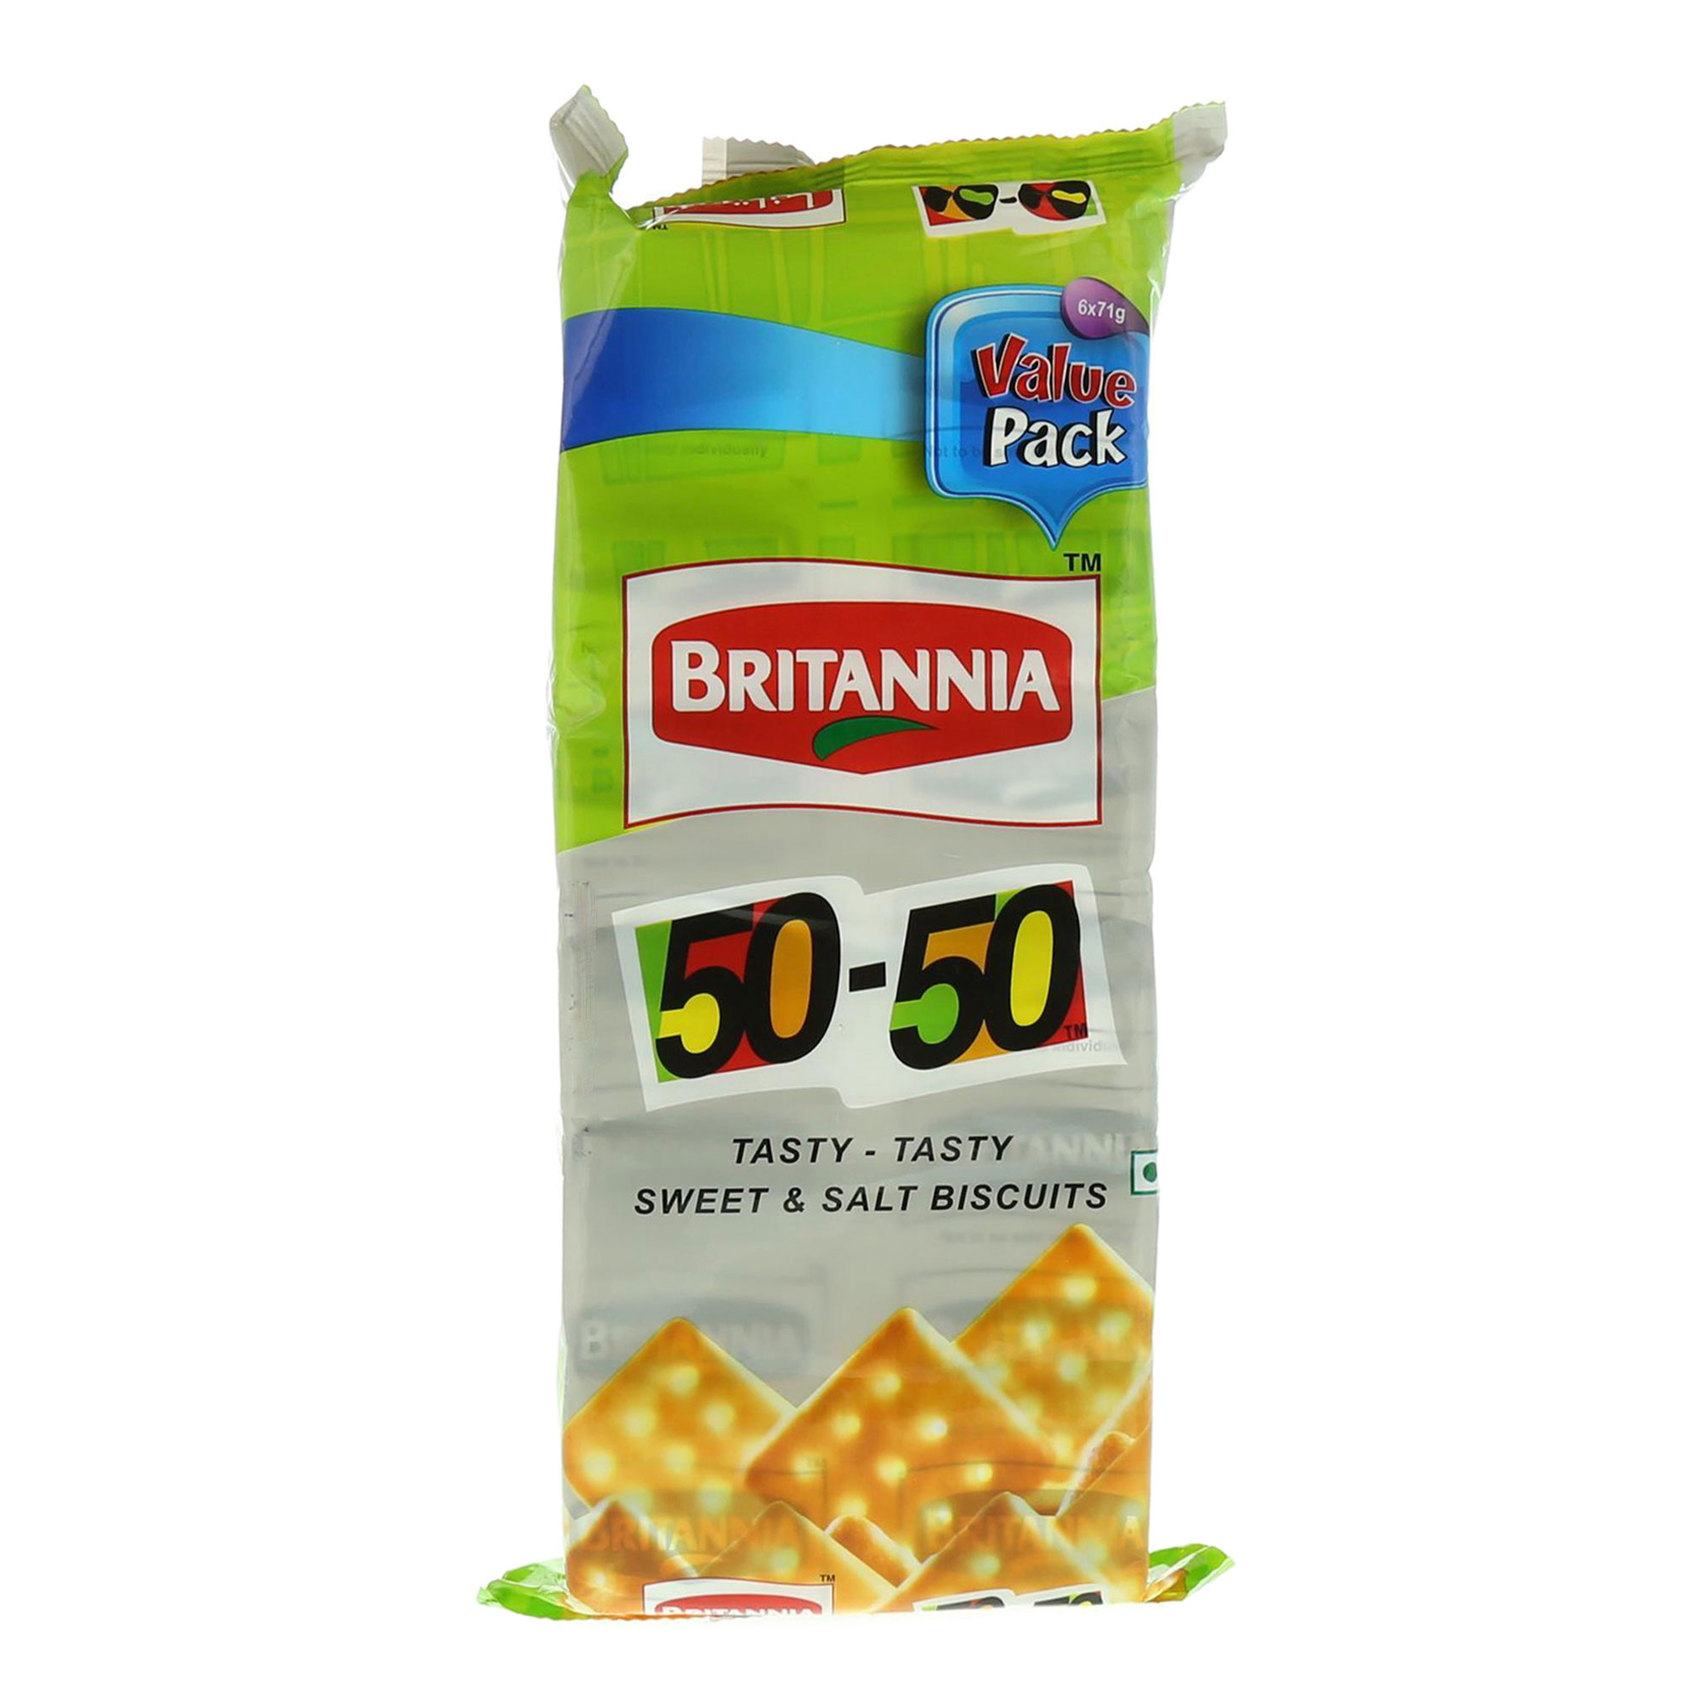 BRITANNIA 50-50 BULK 426G